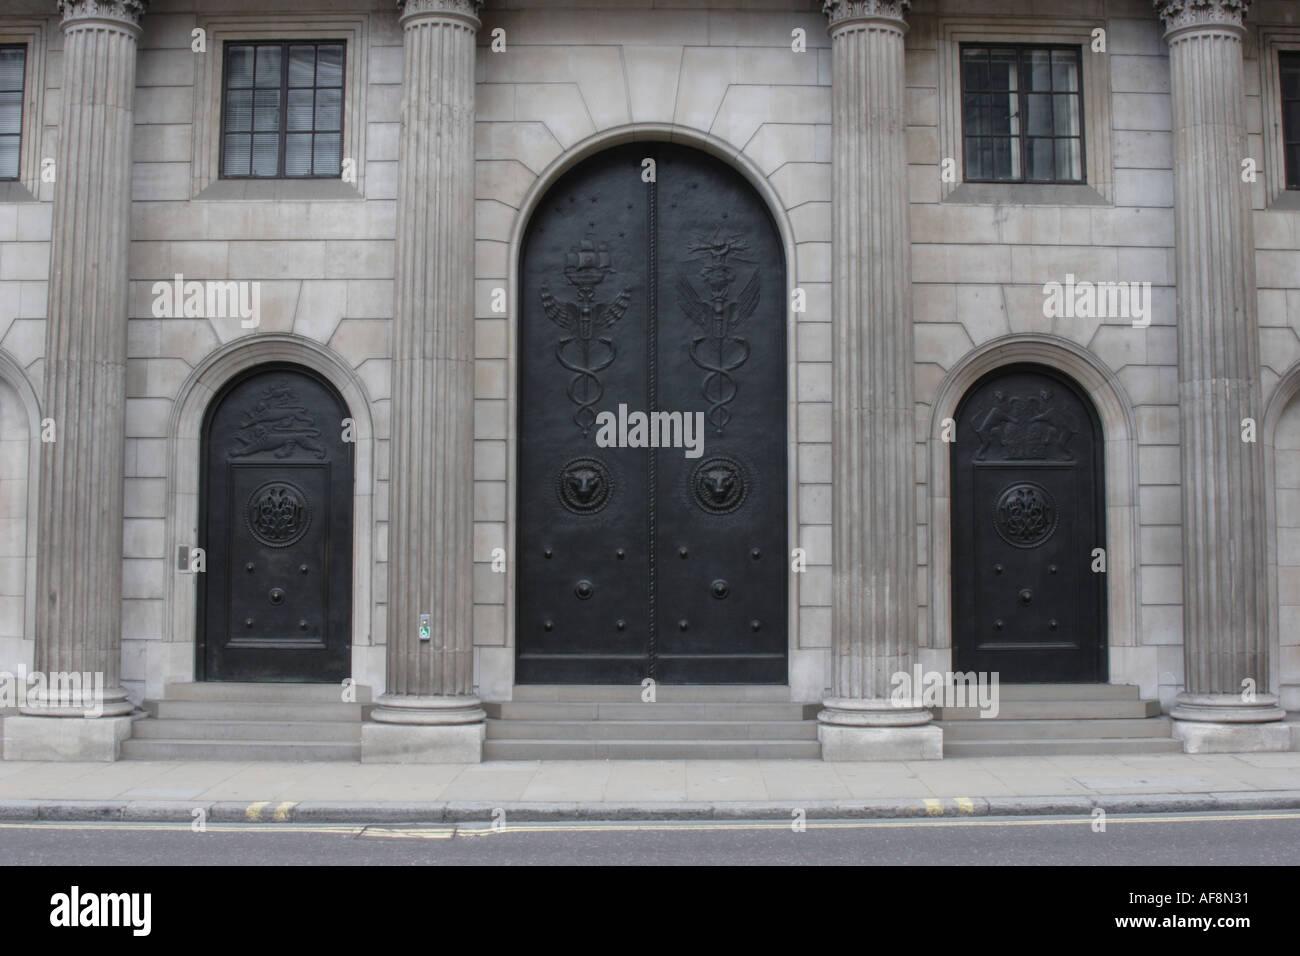 Doors to the Bank of England Threadneedle Street London Stock Photo